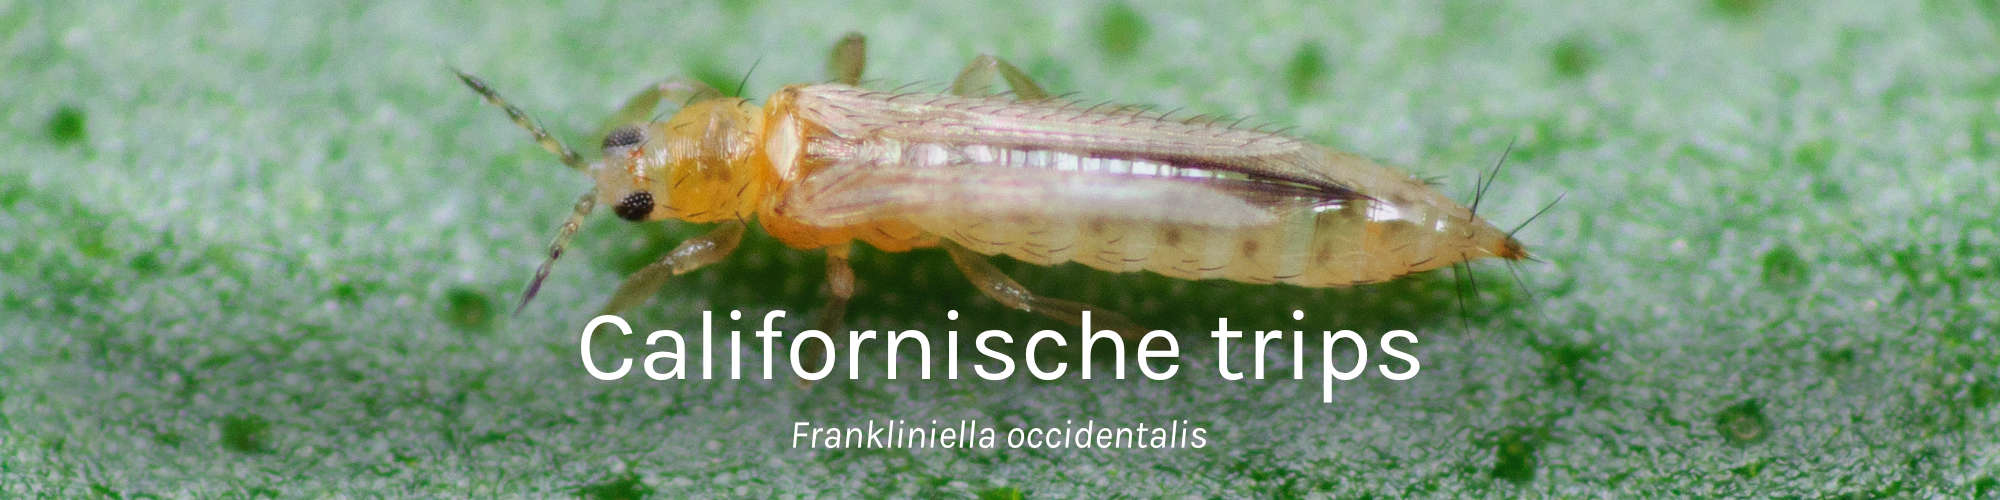 Frankliniella occidentalis Californische trips